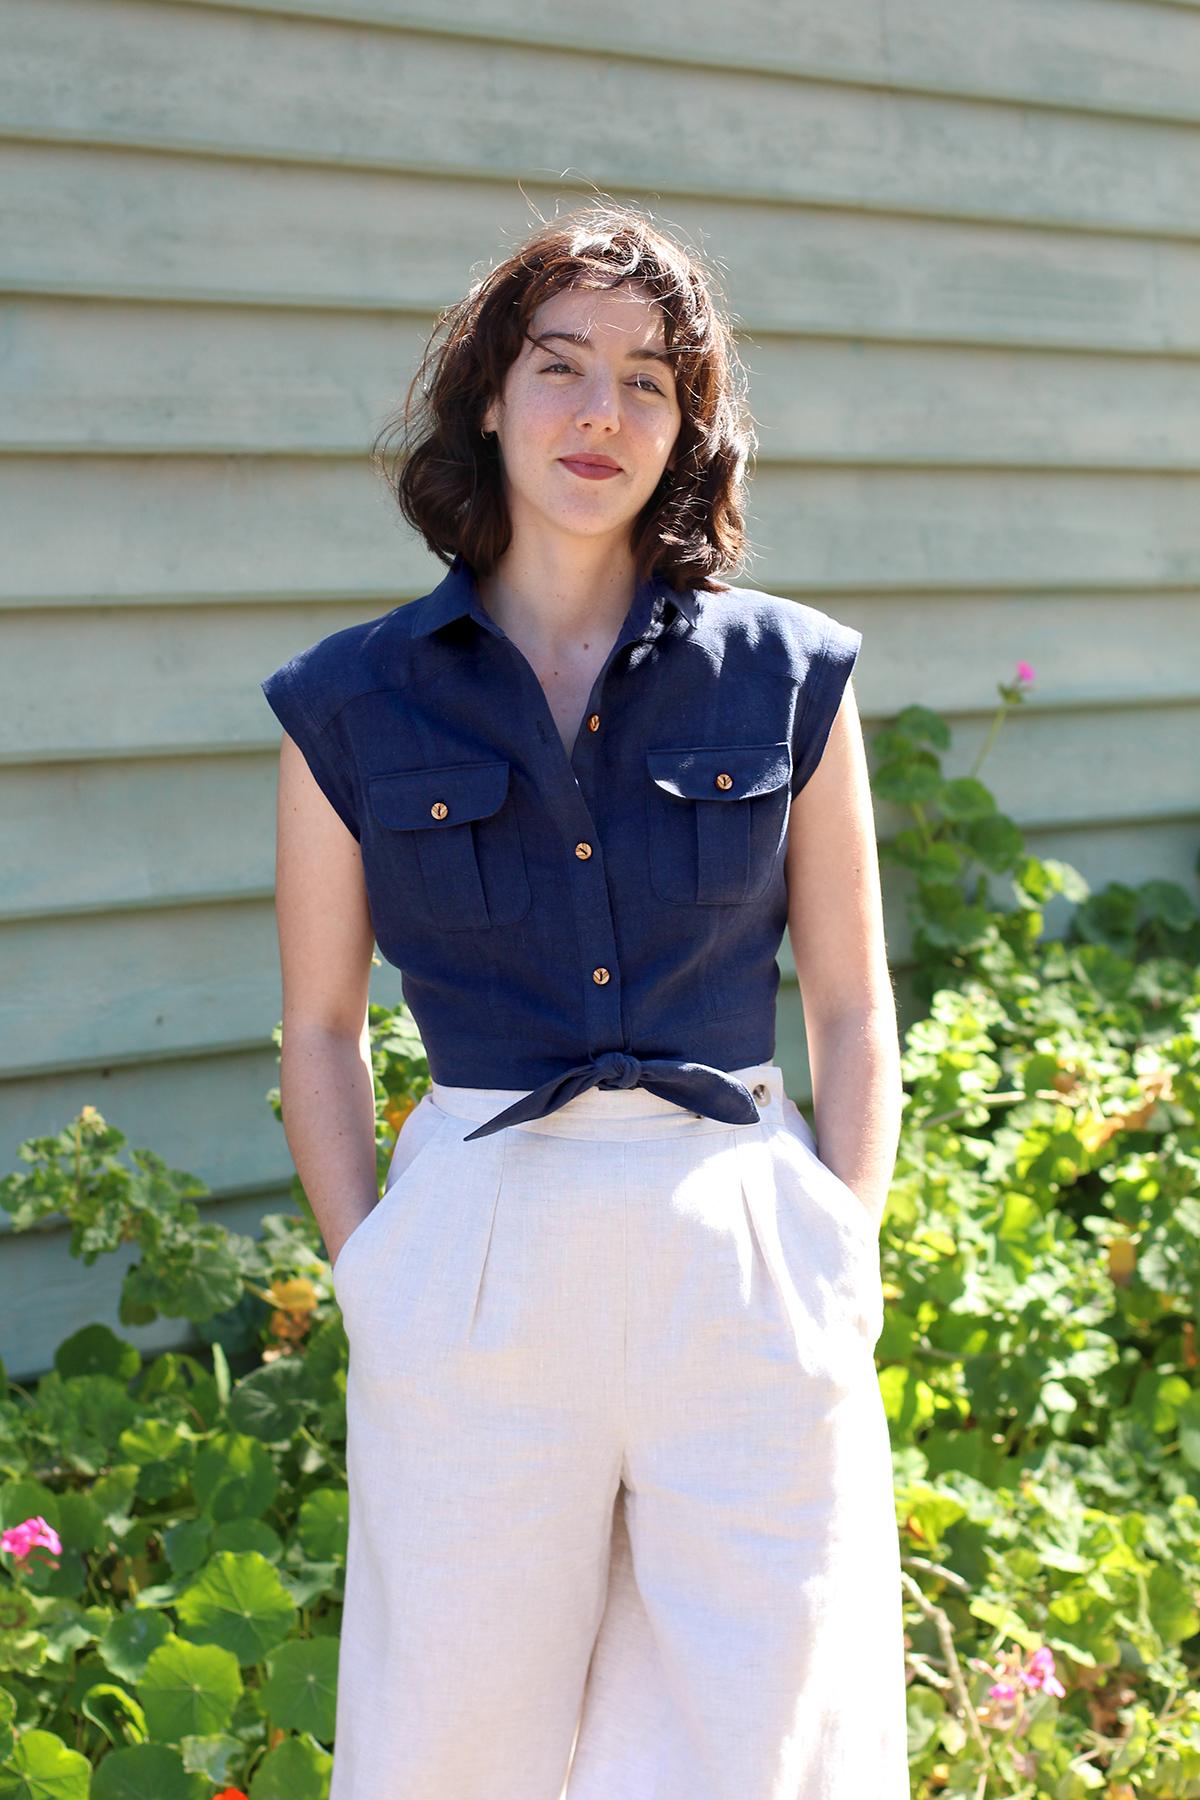 Megan Nielsen Patterns   Matilda Sewalong: Matching Set Hack   The Matilda Top & Flint Pant Combo